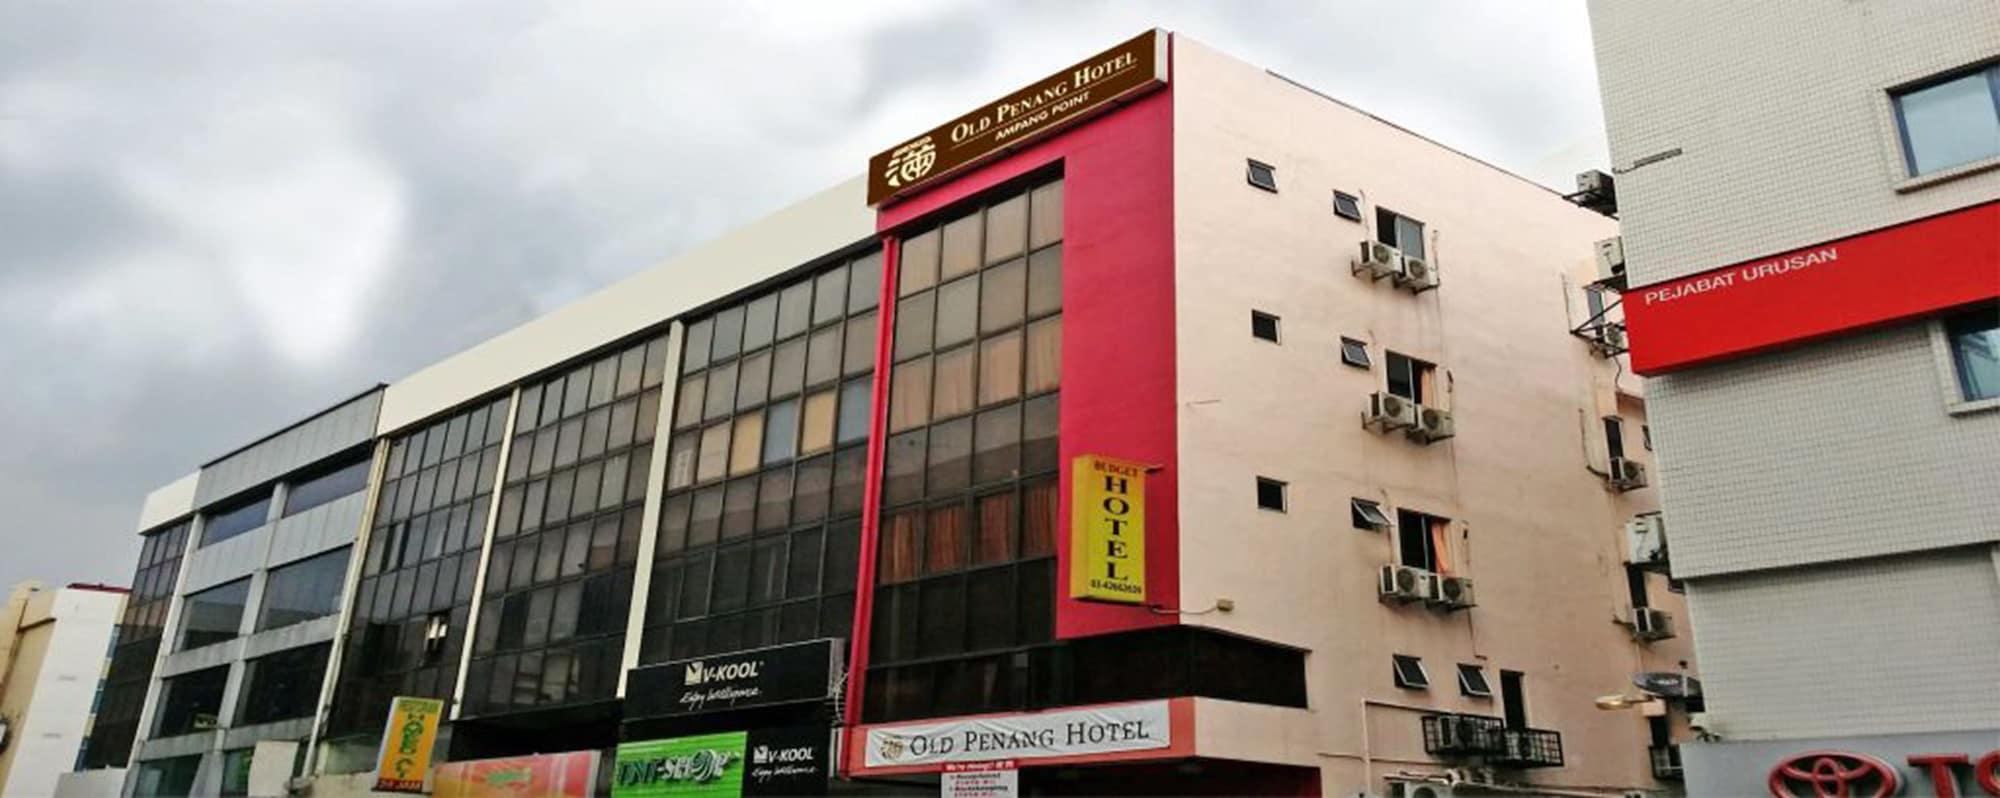 Old Penang Hotel (Ampang Point), Hulu Langat